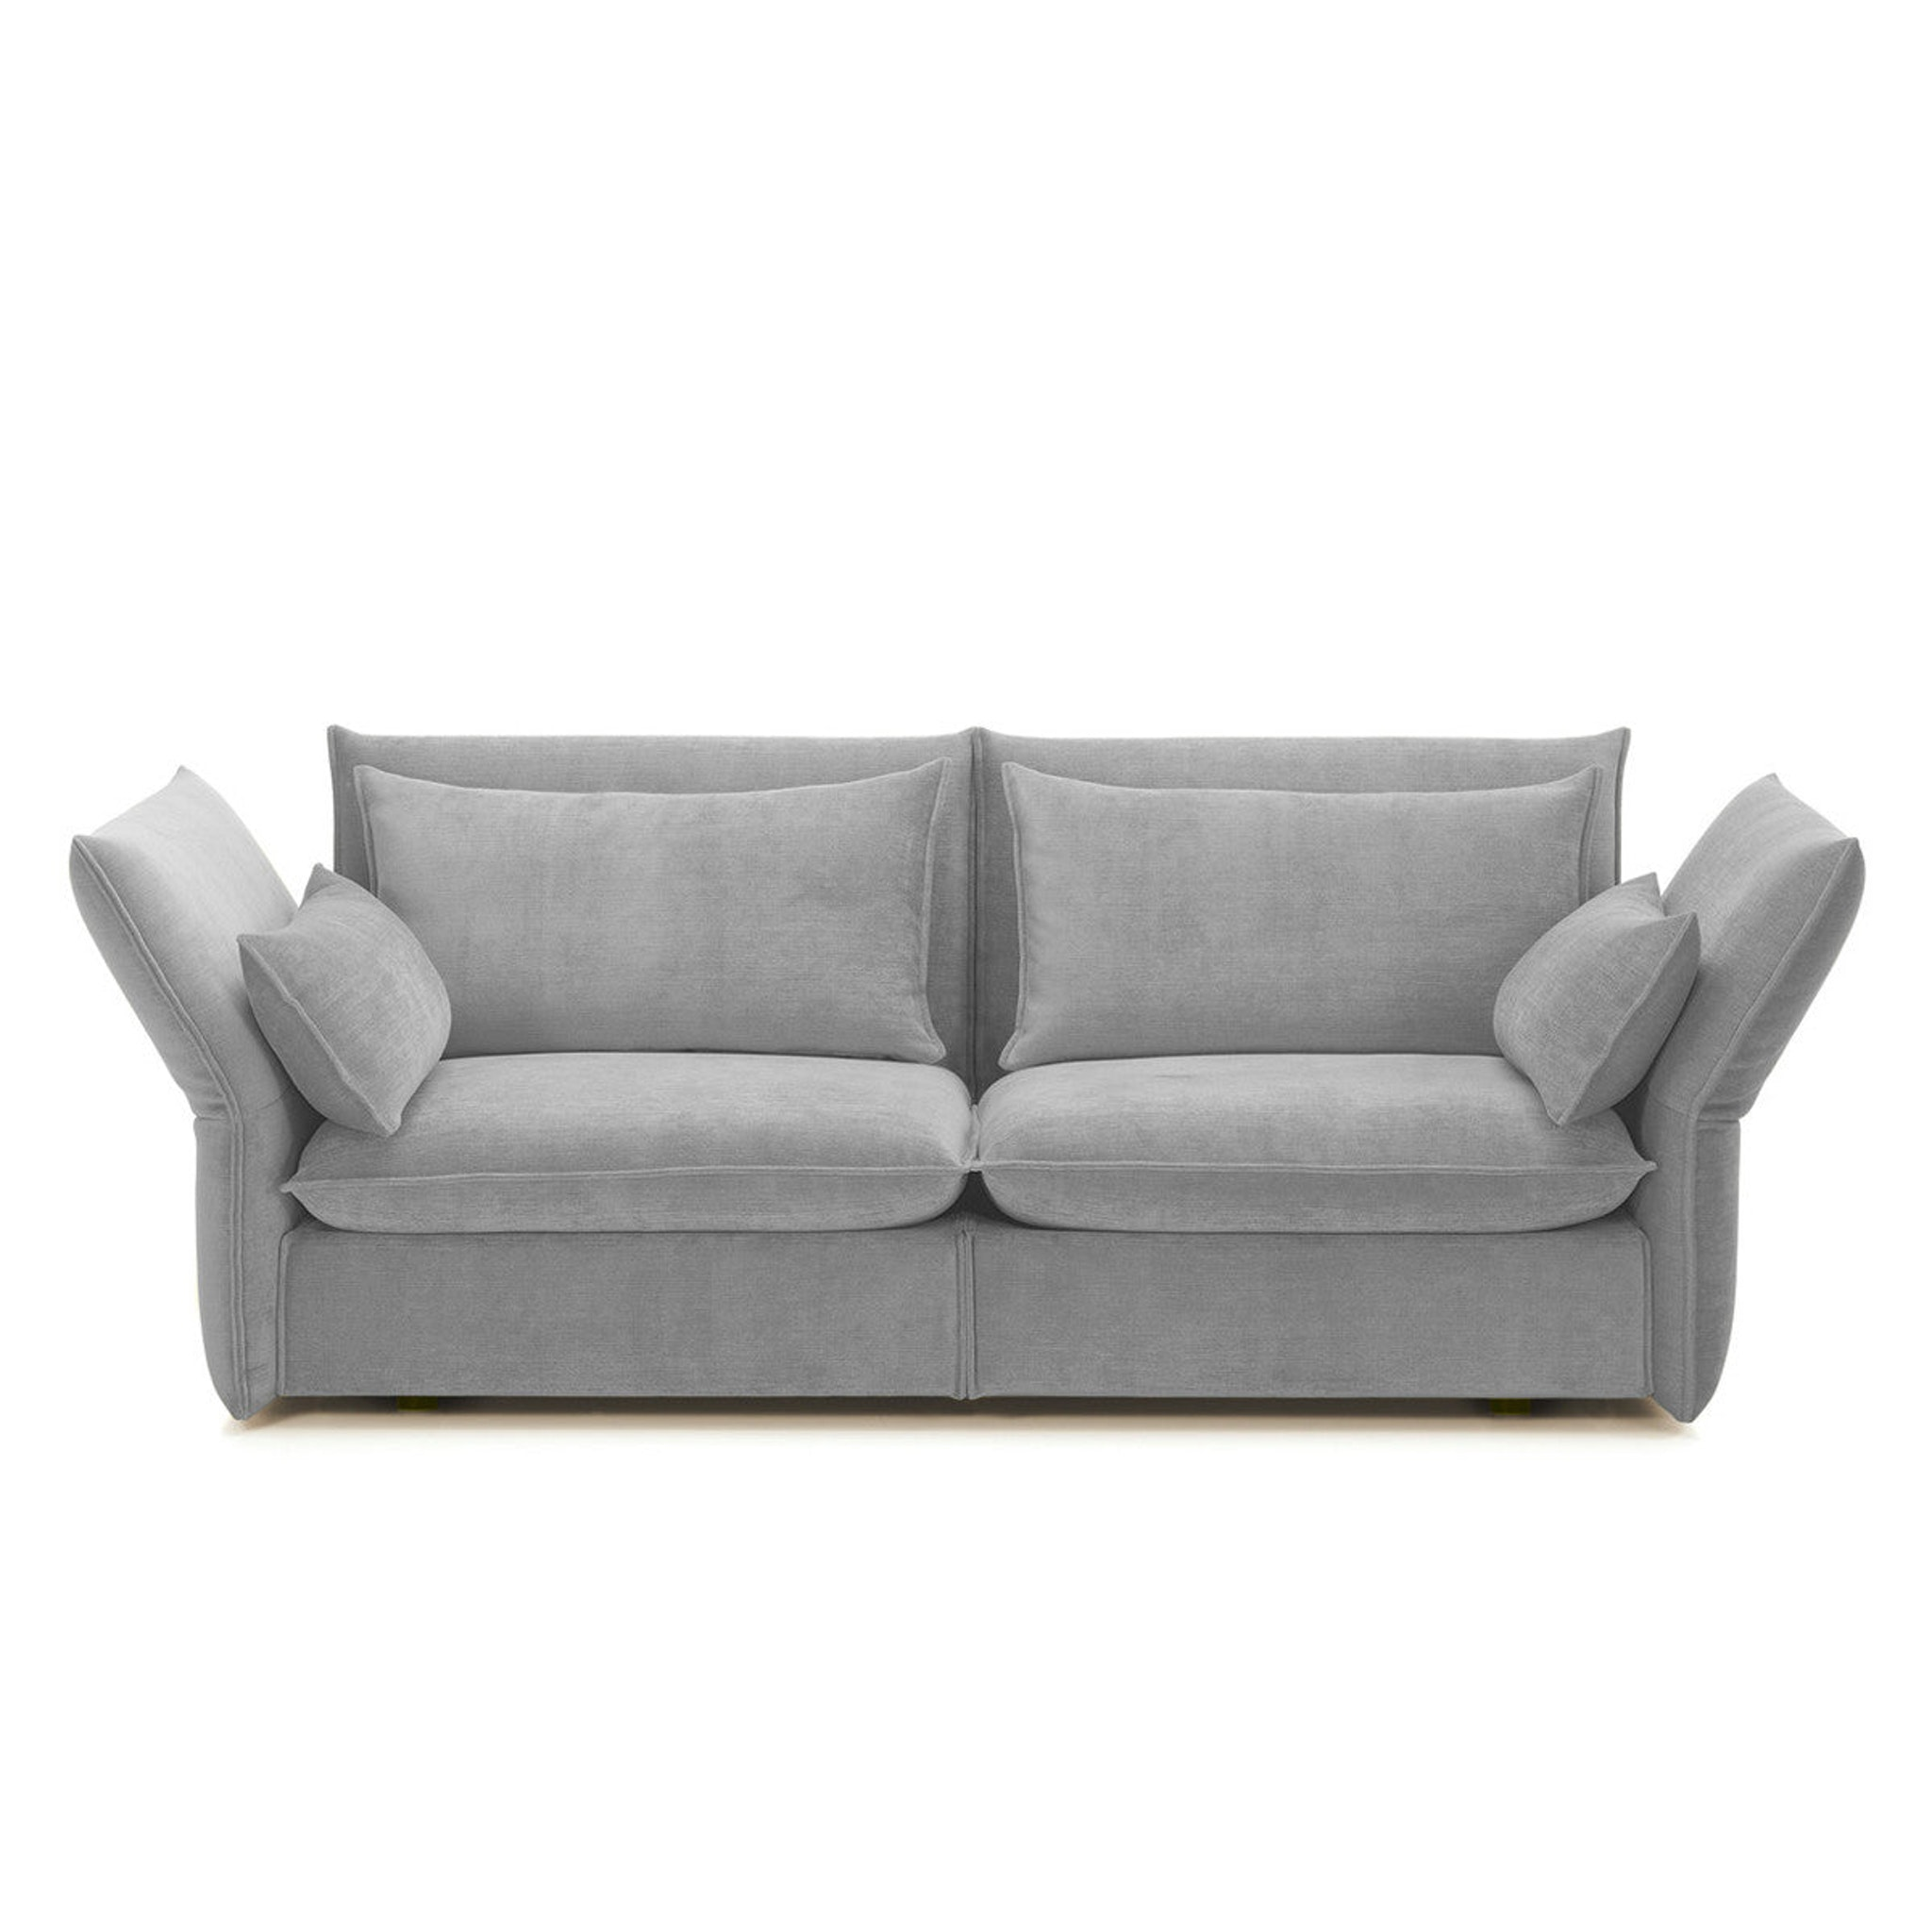 Mariposa Sofa By Vitra Haus 174